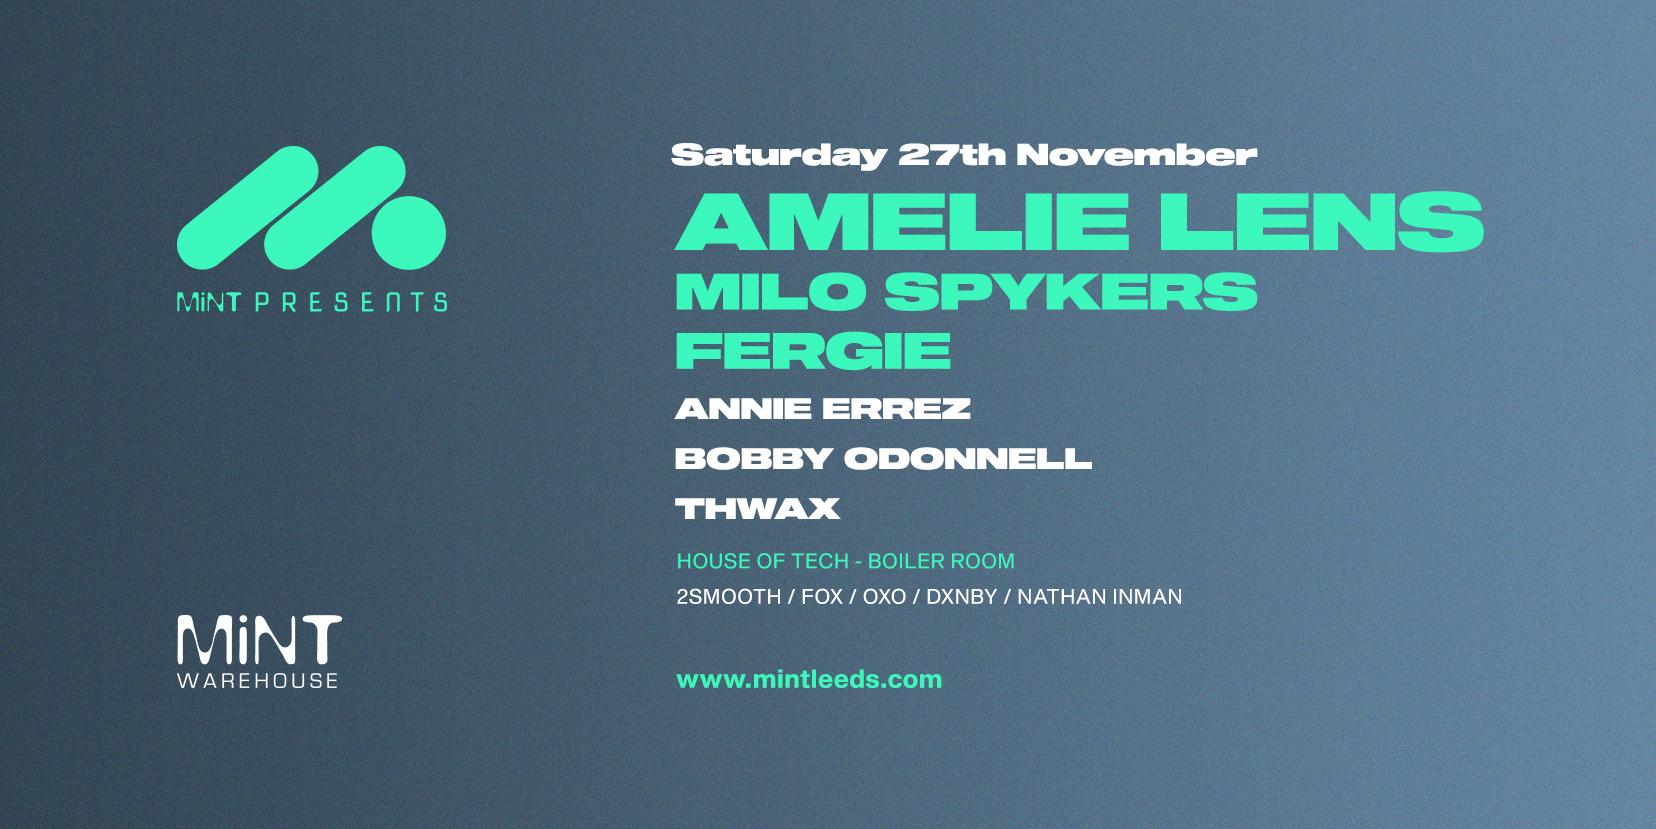 Amelie Lens, Milo Spykers, Fergie @ MiNT Warehouse